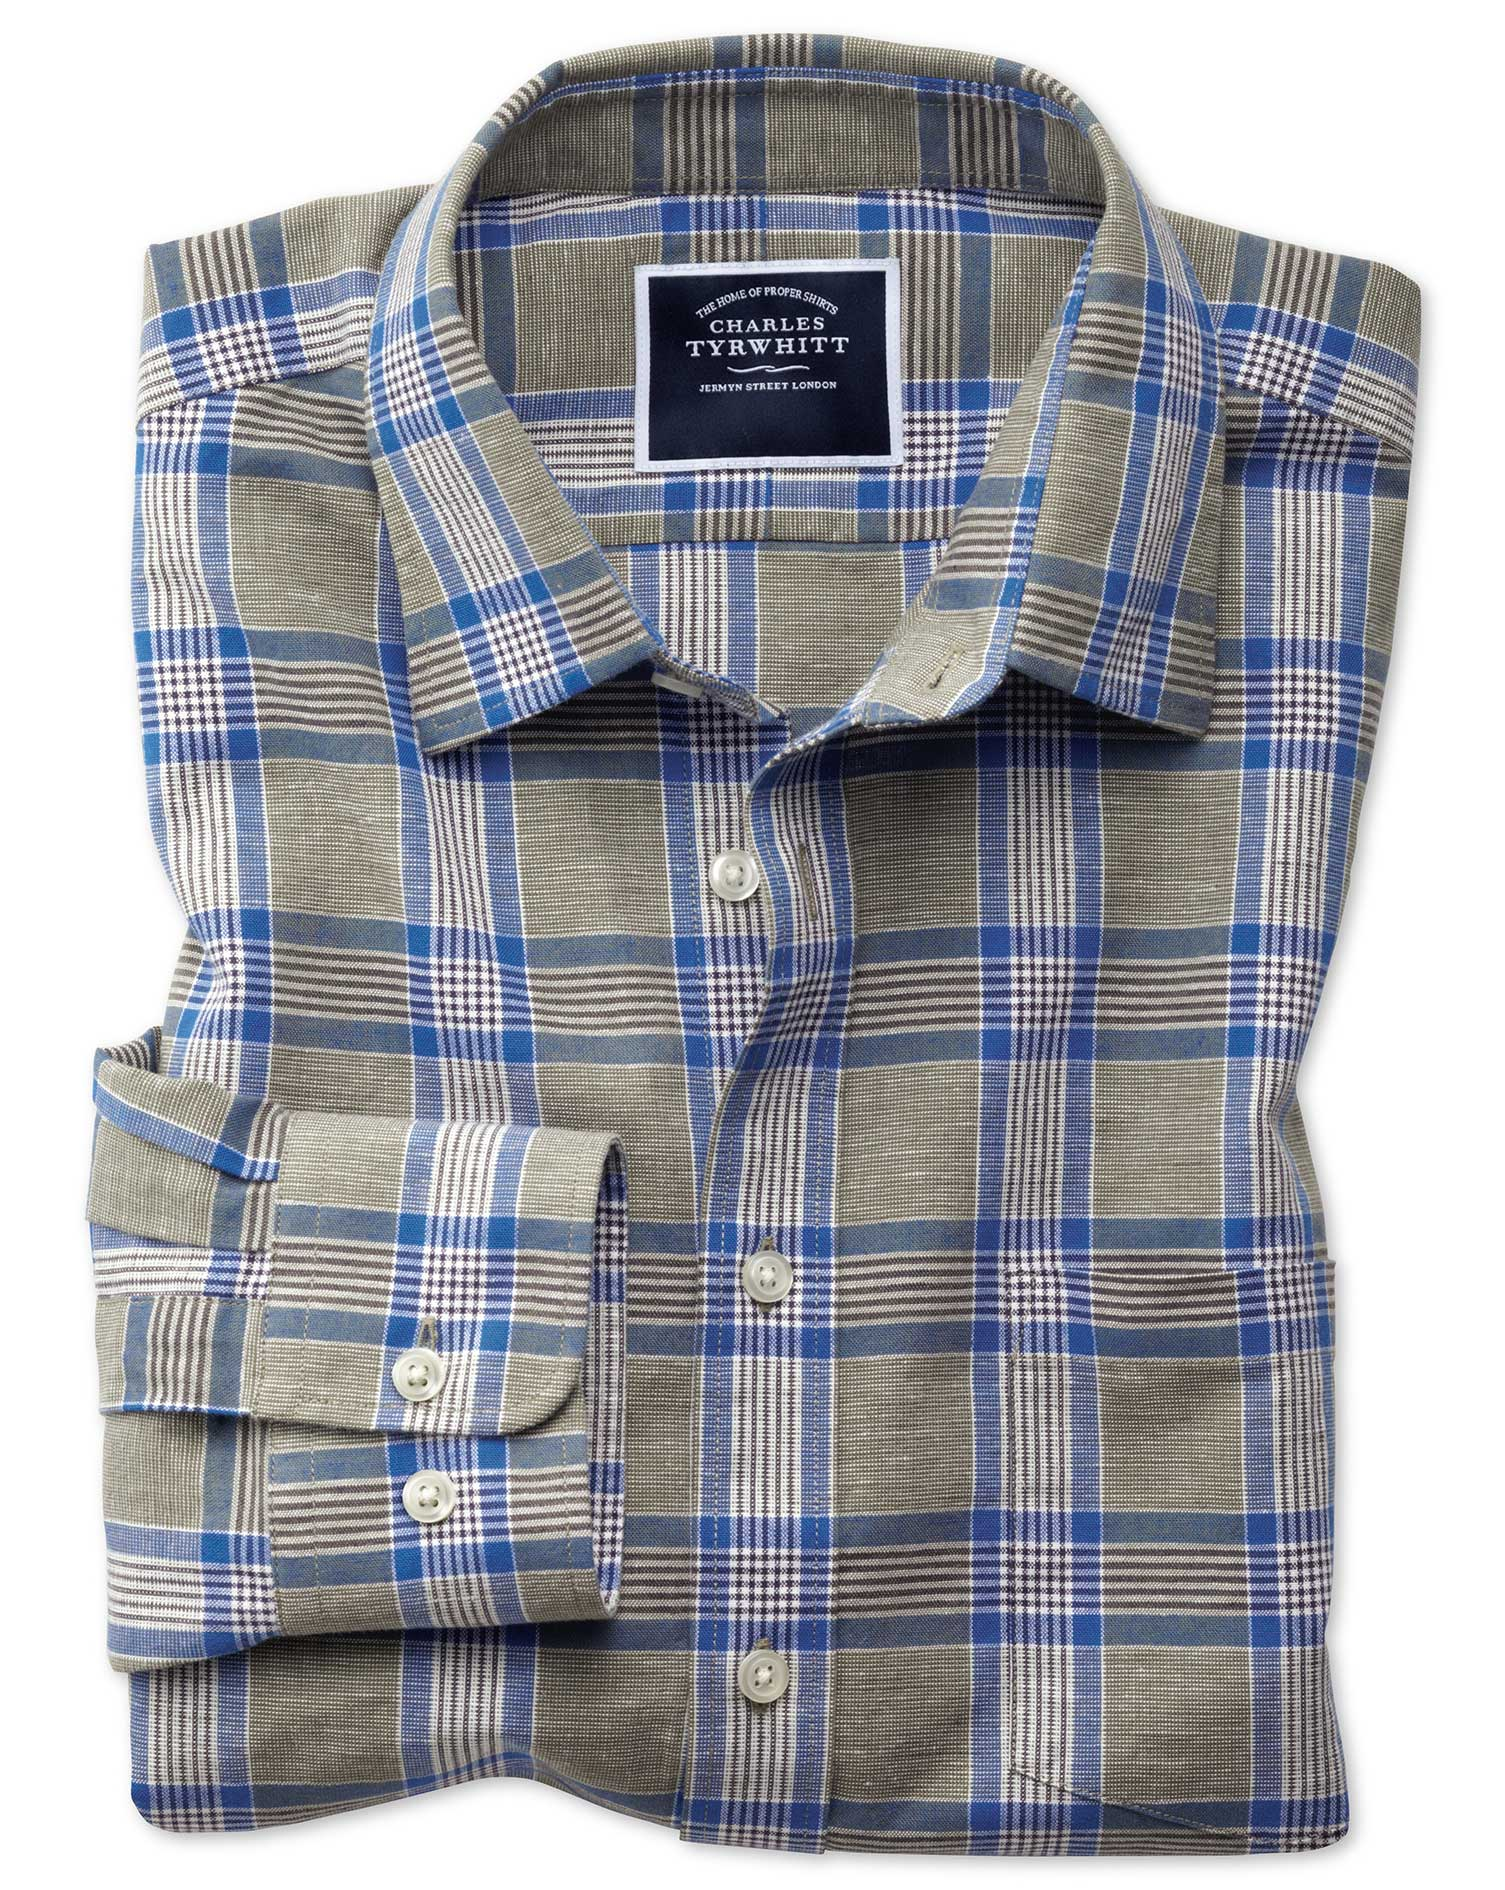 Classic Fit Cotton Linen Khaki Check Shirt Single Cuff Size Small by Charles Tyrwhitt